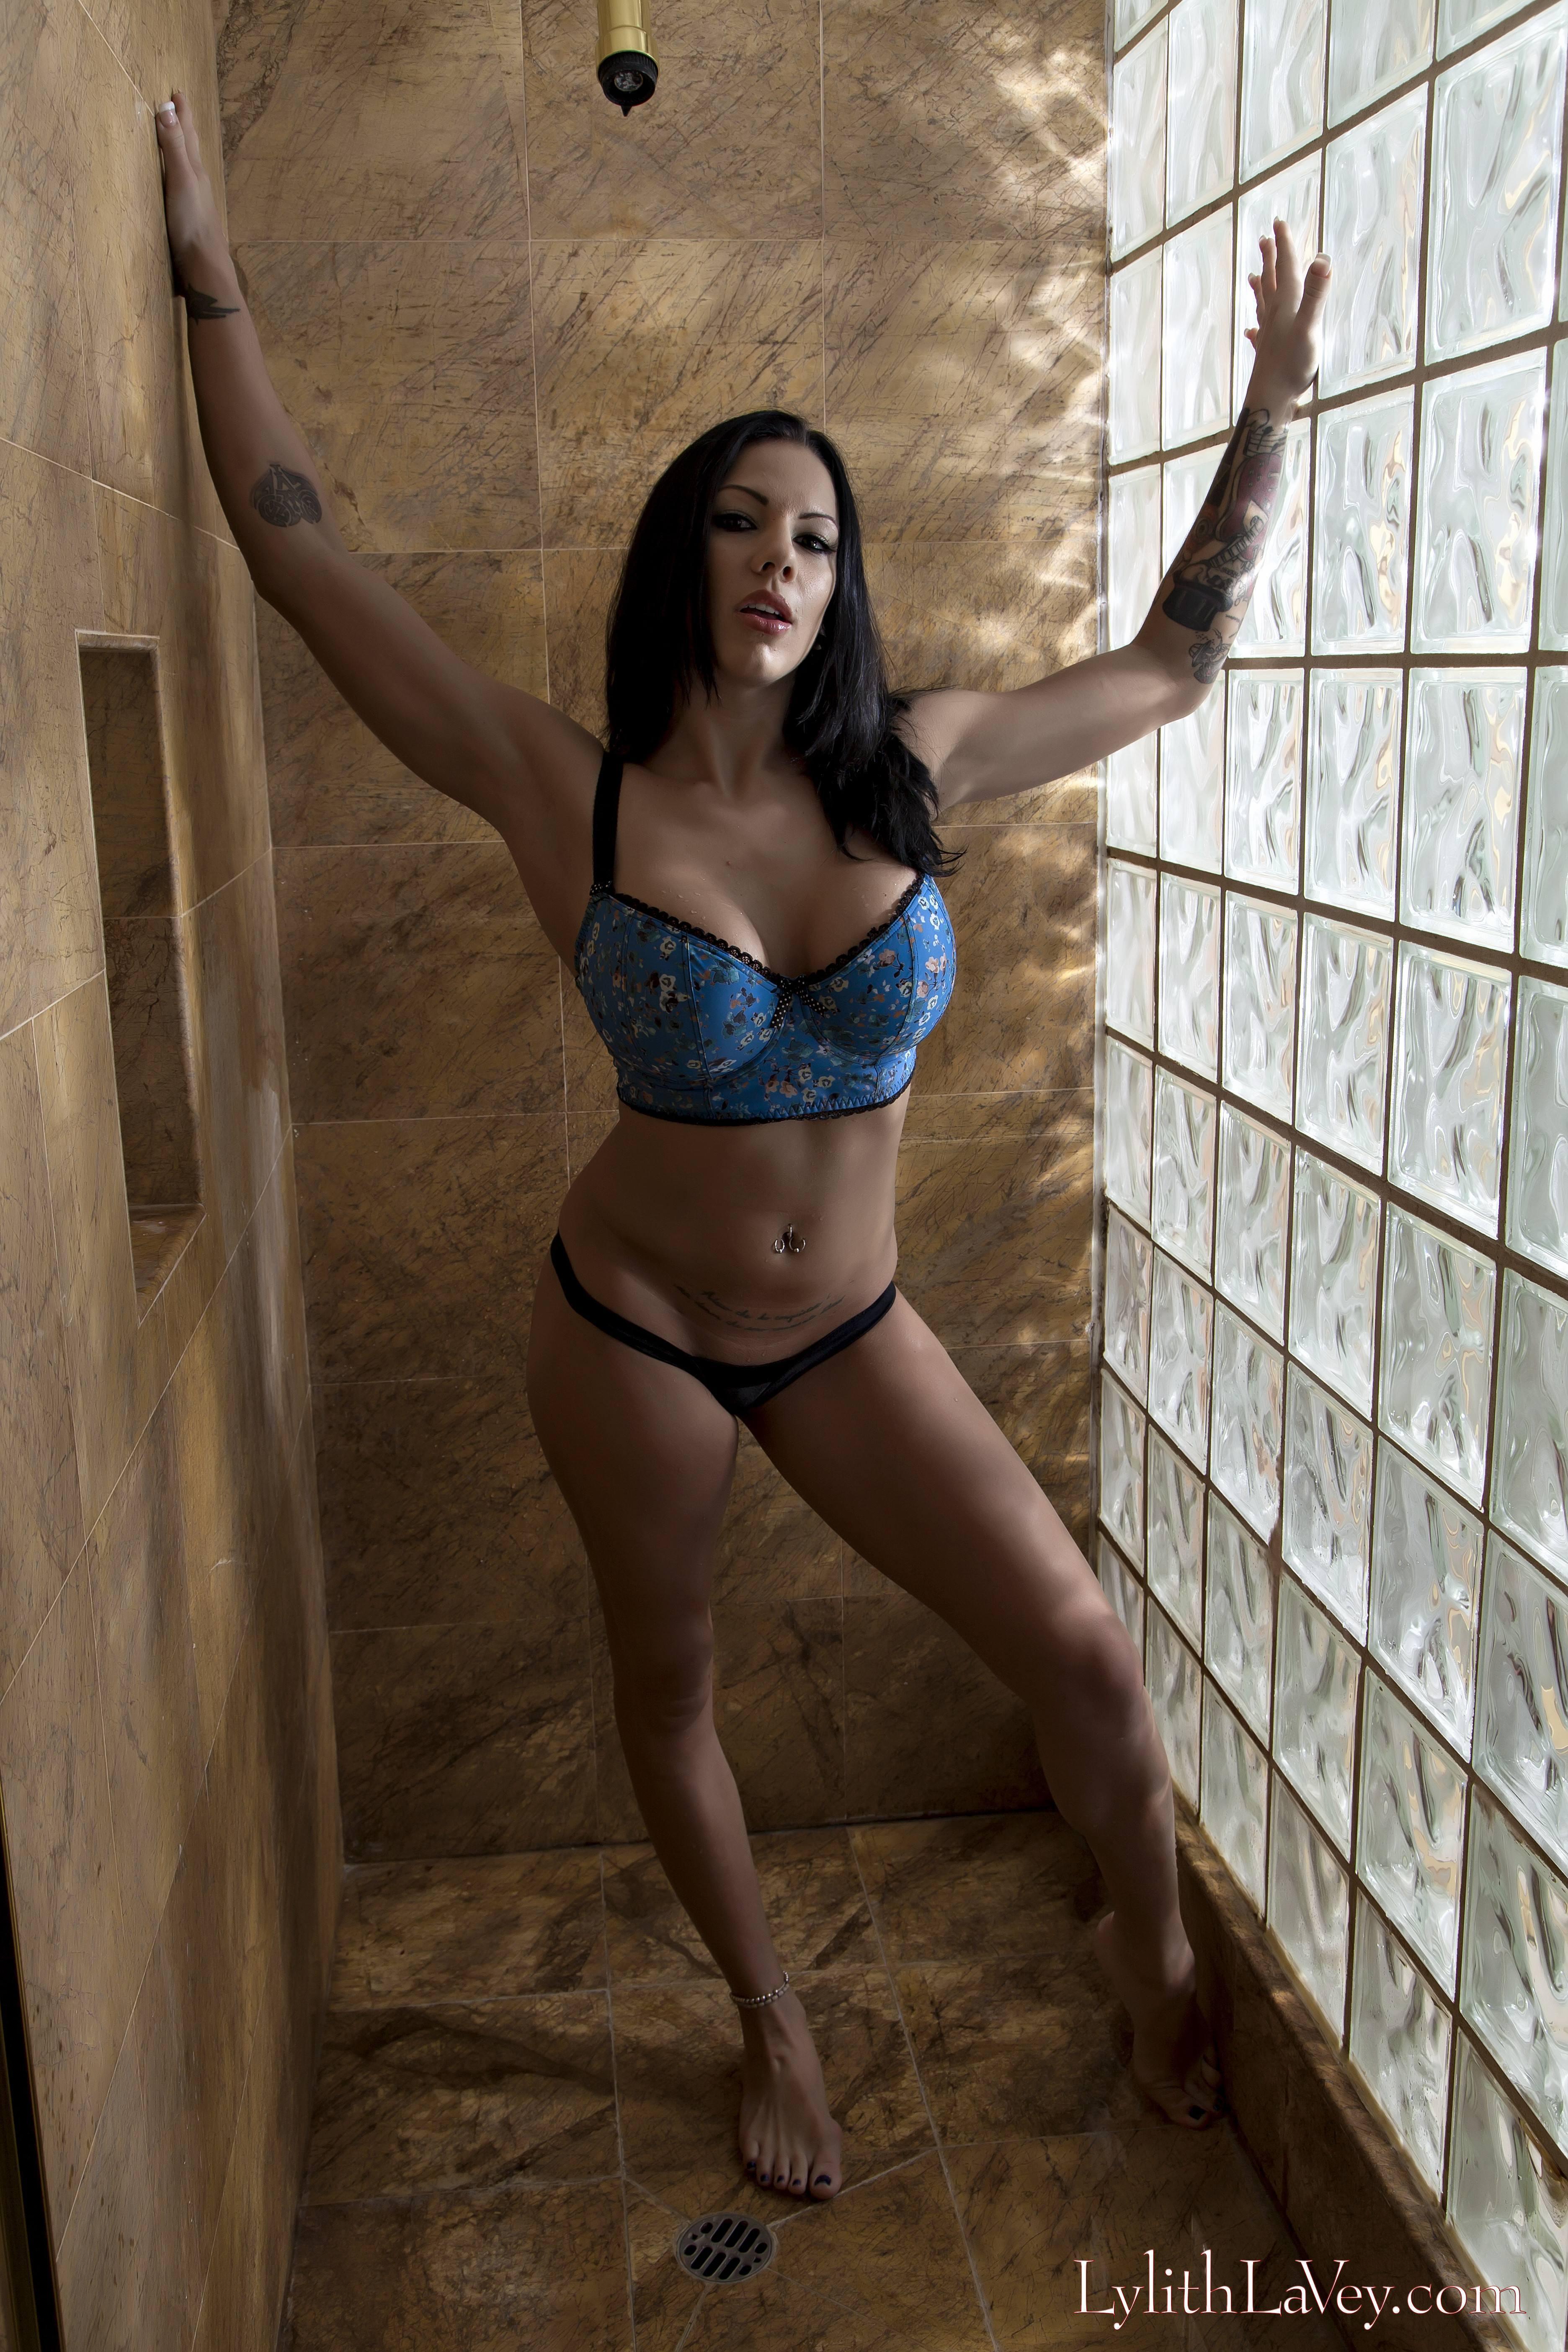 Lylith Lavey Nude Photos 87